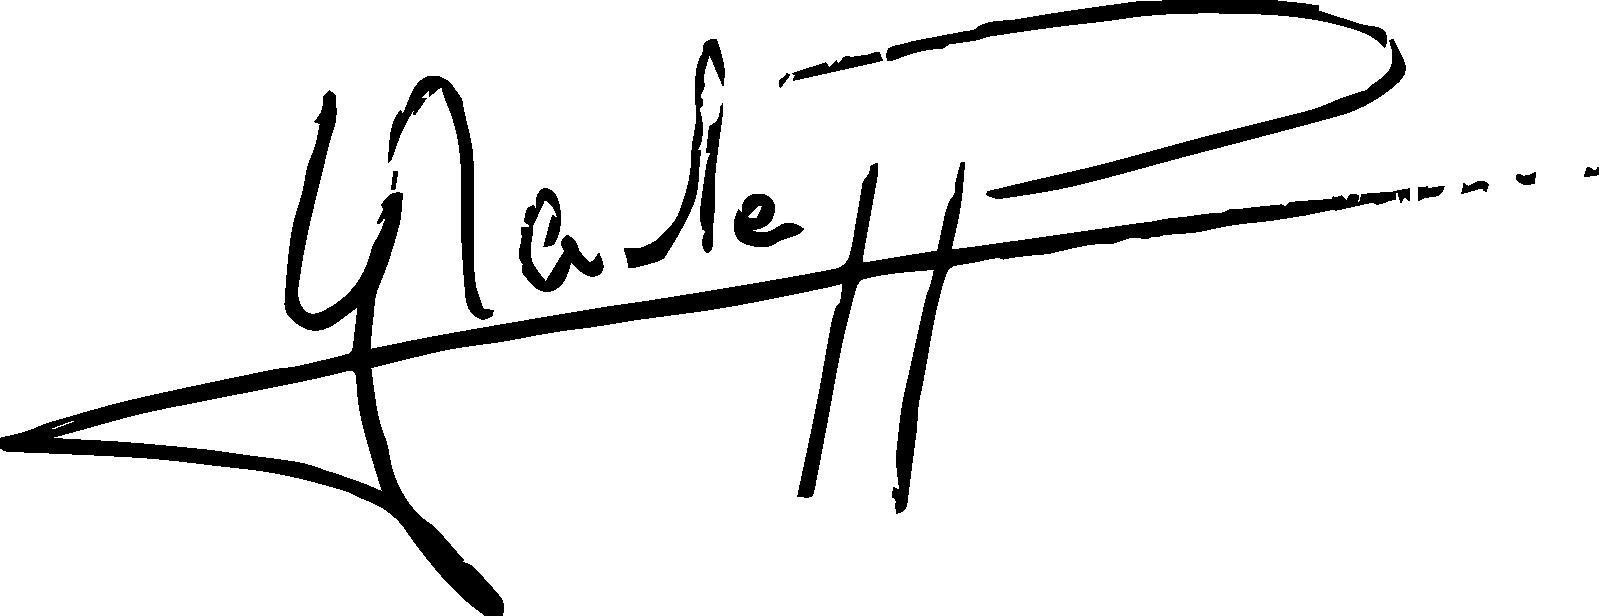 Signature les Rhums du sud